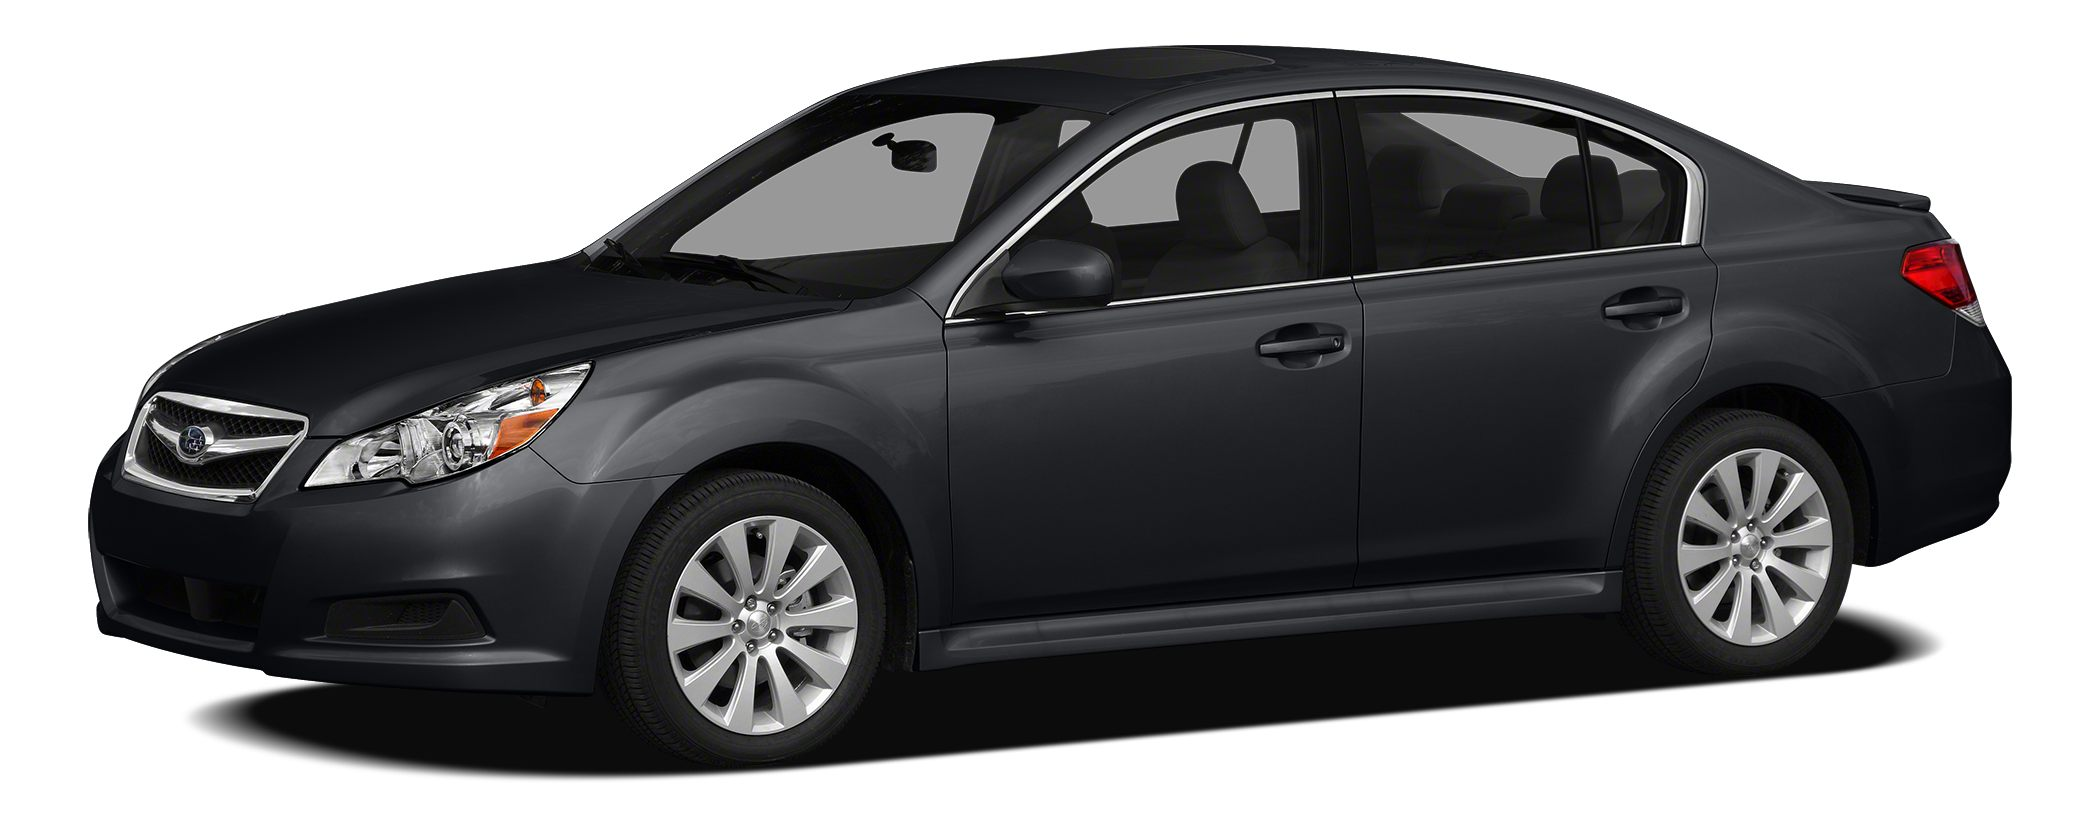 2012 Subaru Legacy 25i Miles 63812Color Graphite Gray Metallic Stock 152207A VIN 4S3BMAA62C